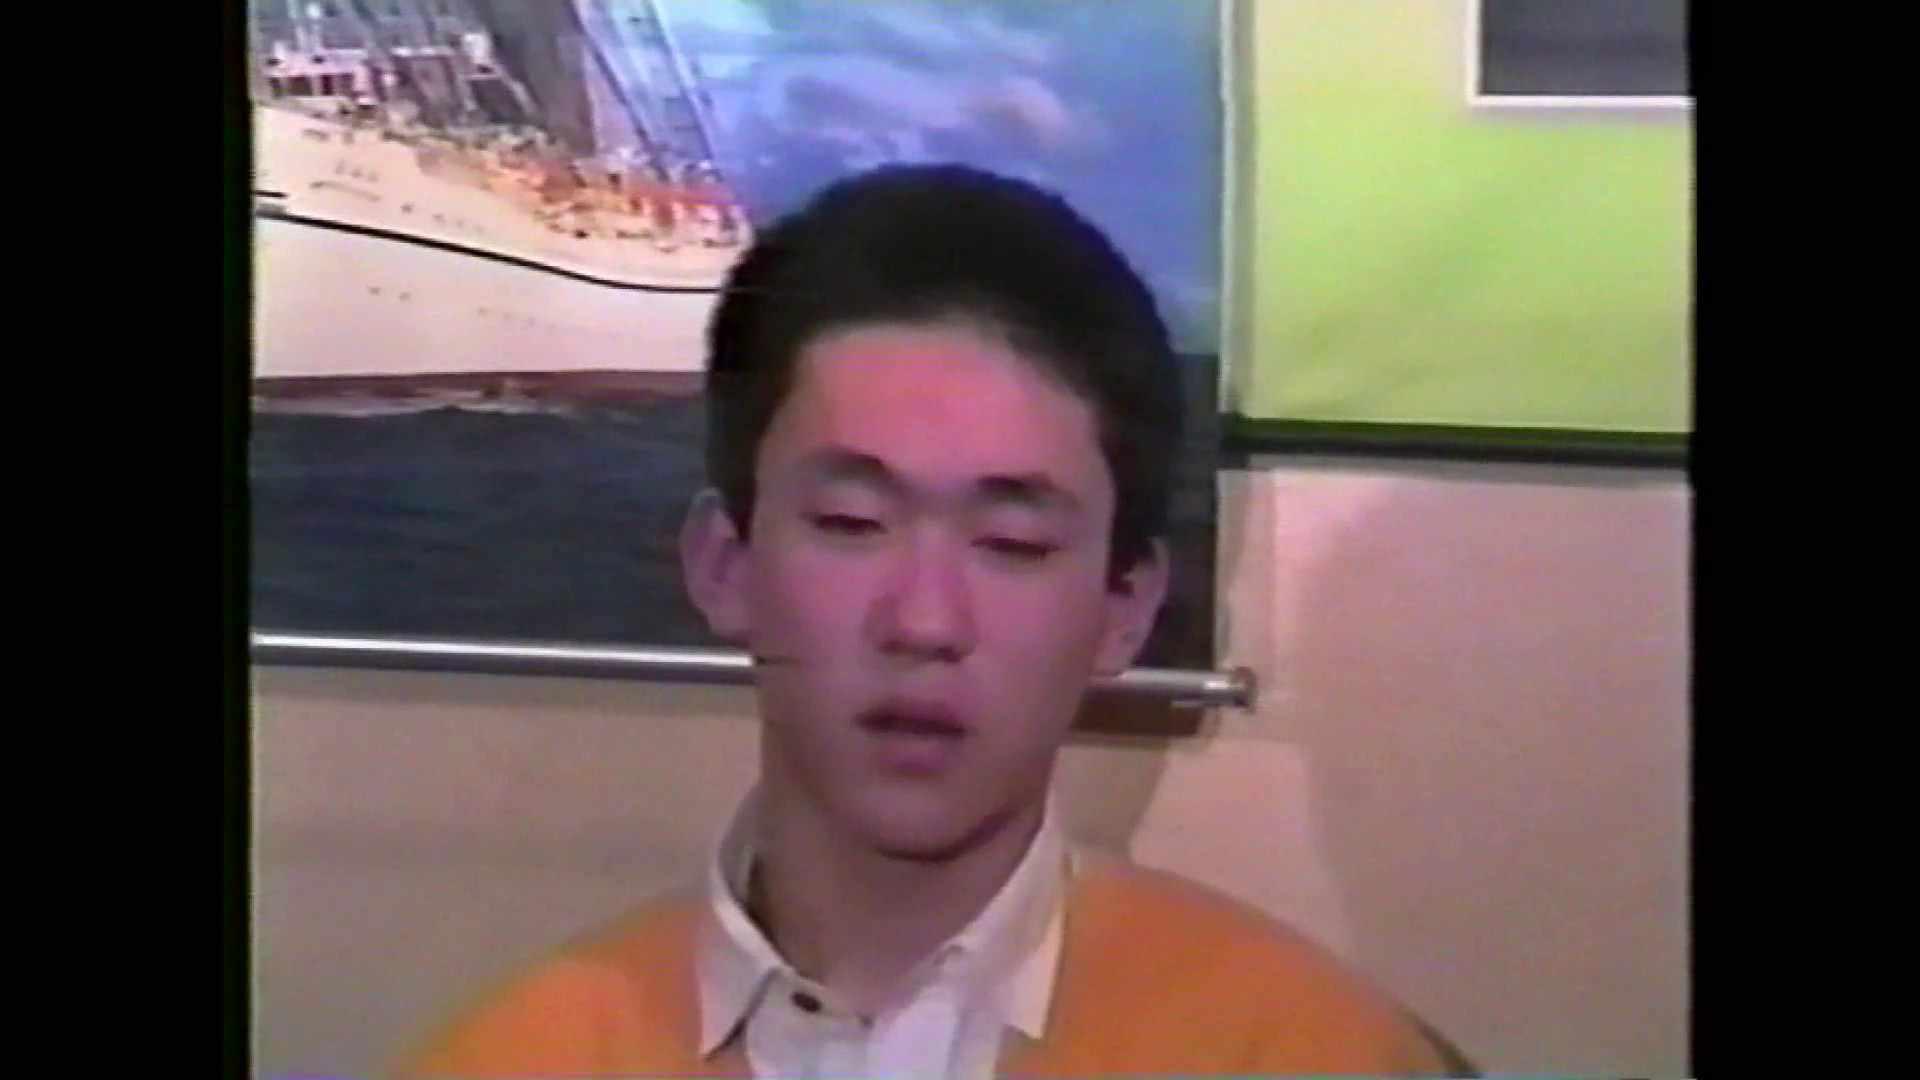 GAYBOY宏のオカズ倉庫Vol.2-1 ノンケ  89pic 2